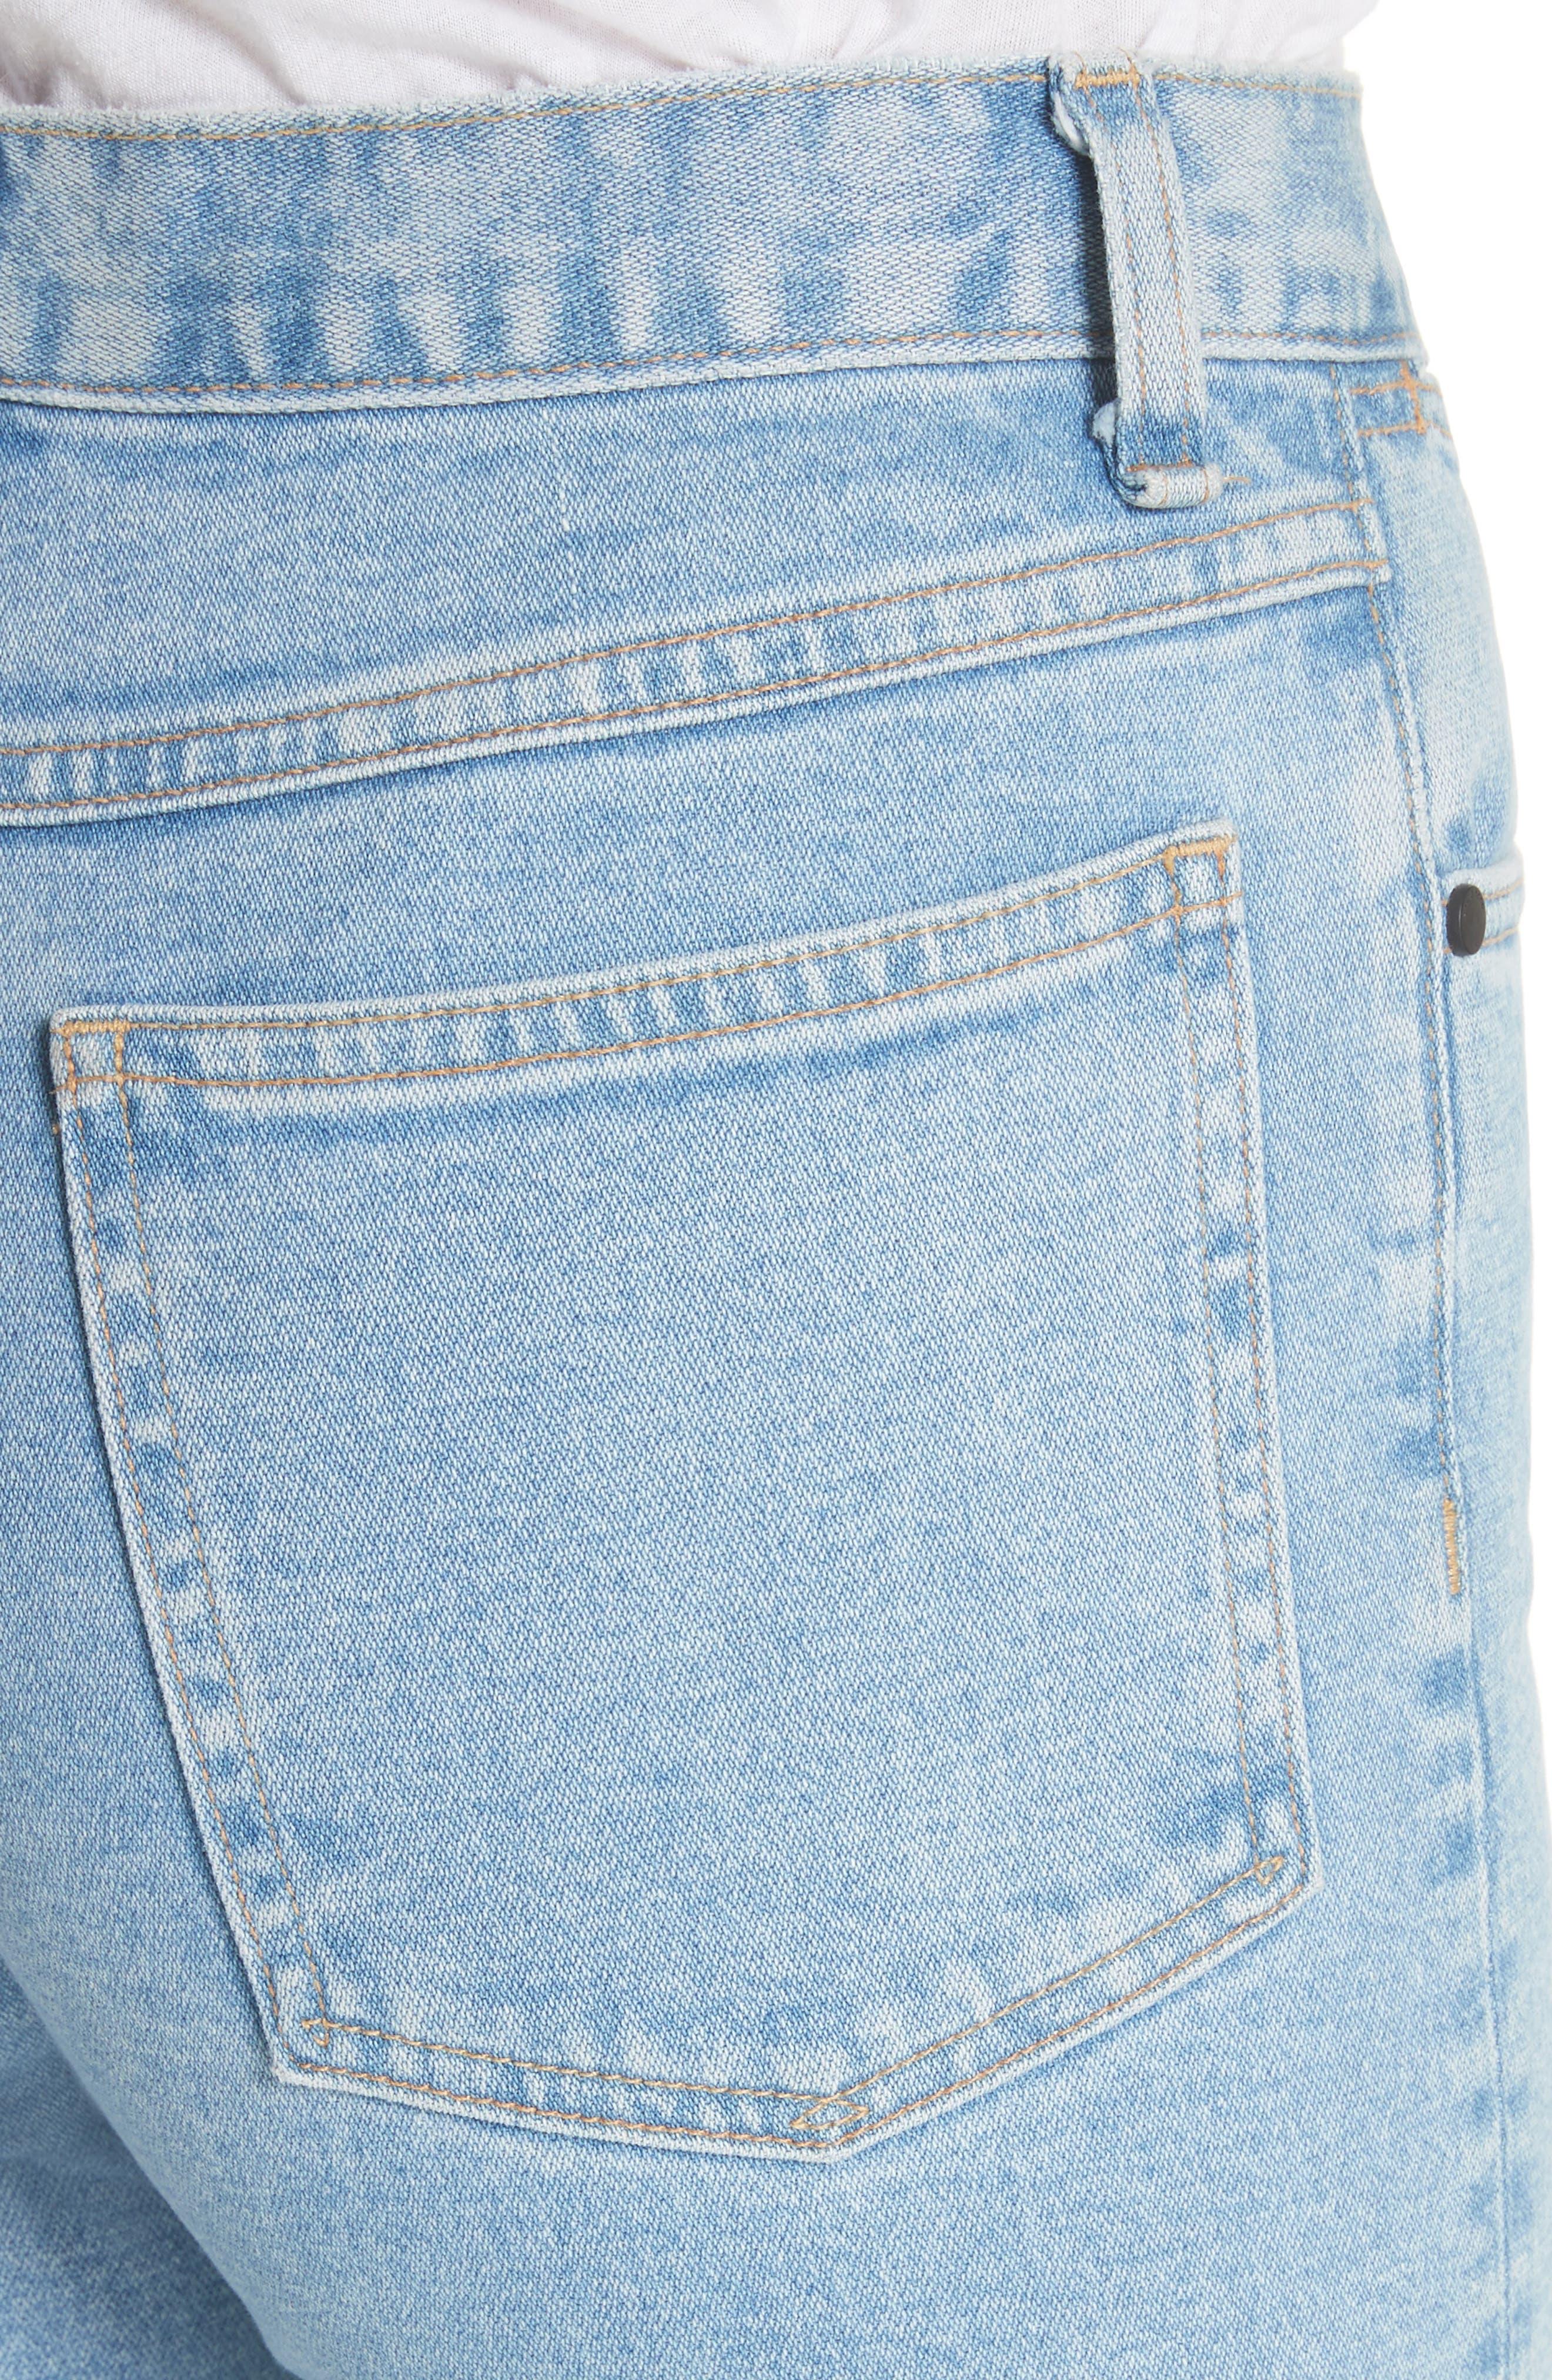 Justine High Waist Wide Leg Trouser Jeans,                             Alternate thumbnail 4, color,                             450